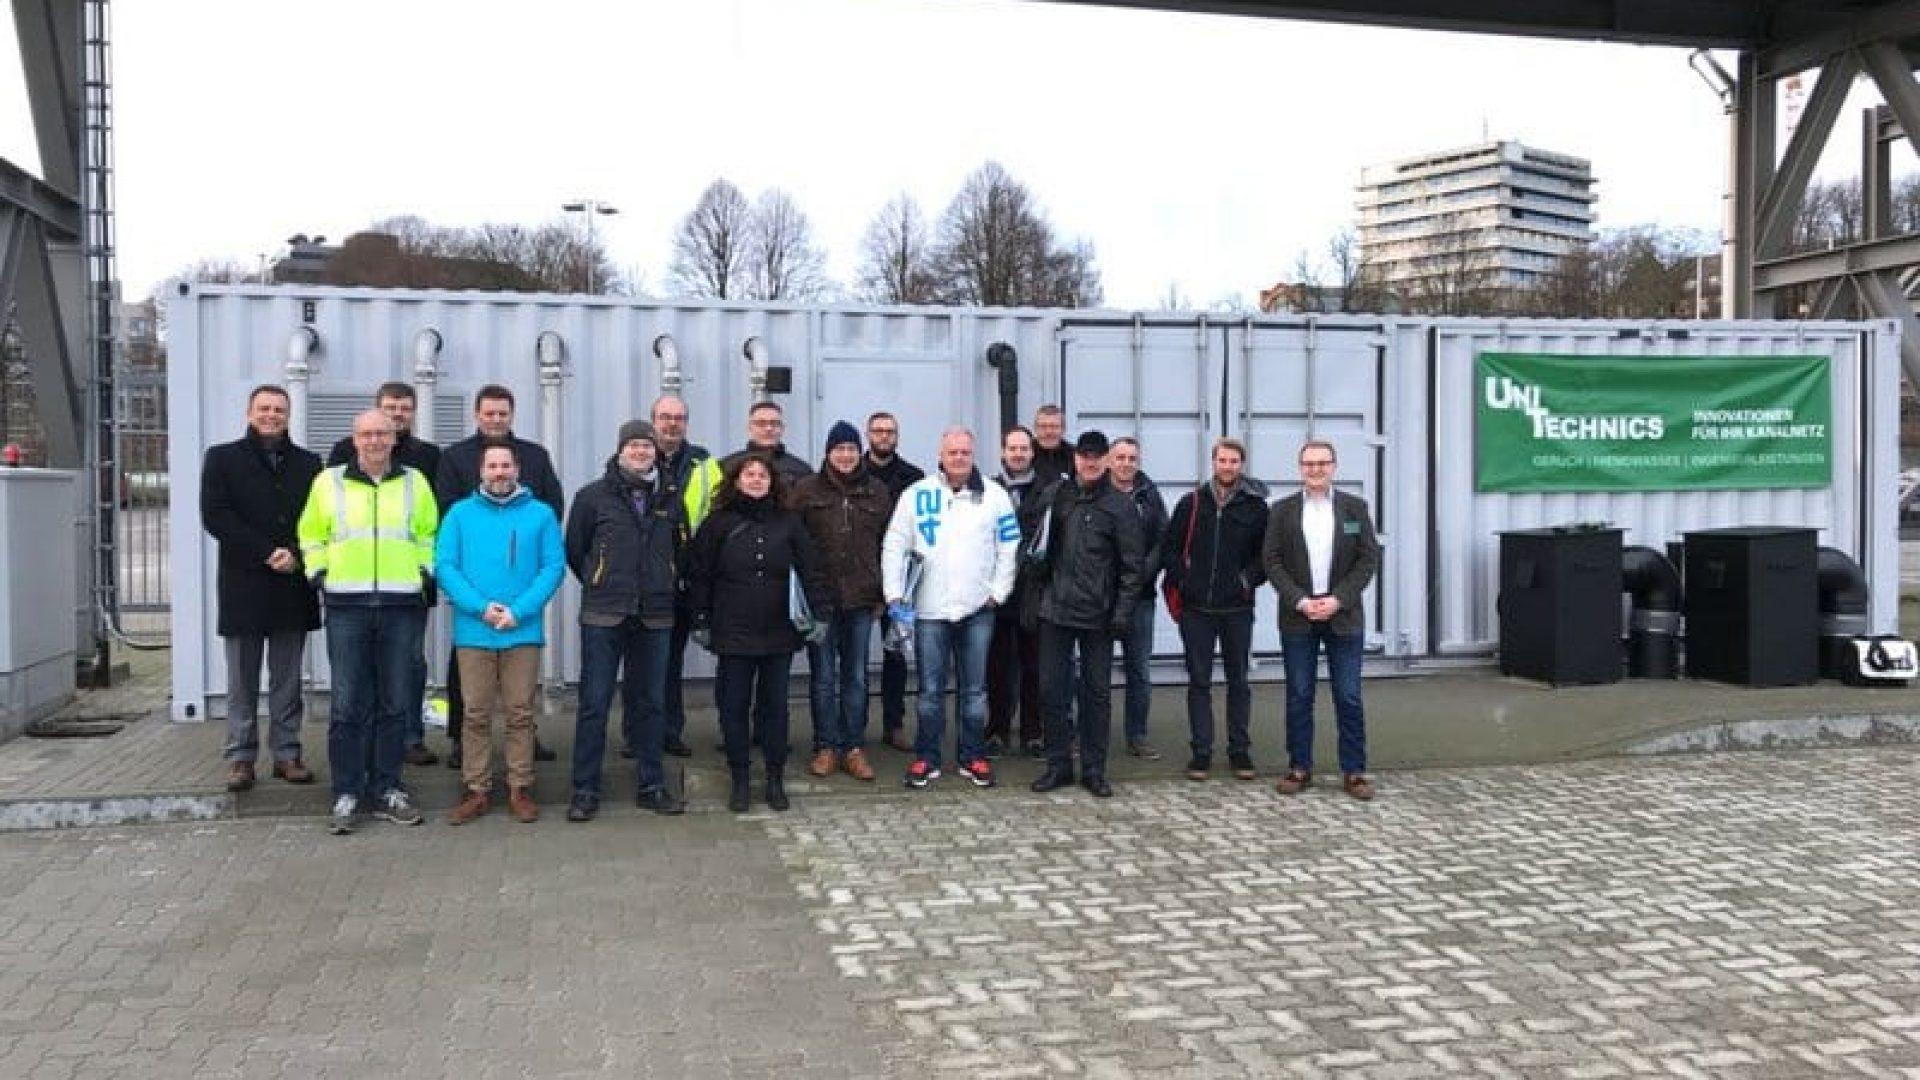 hst_on_tour_Kiel_4